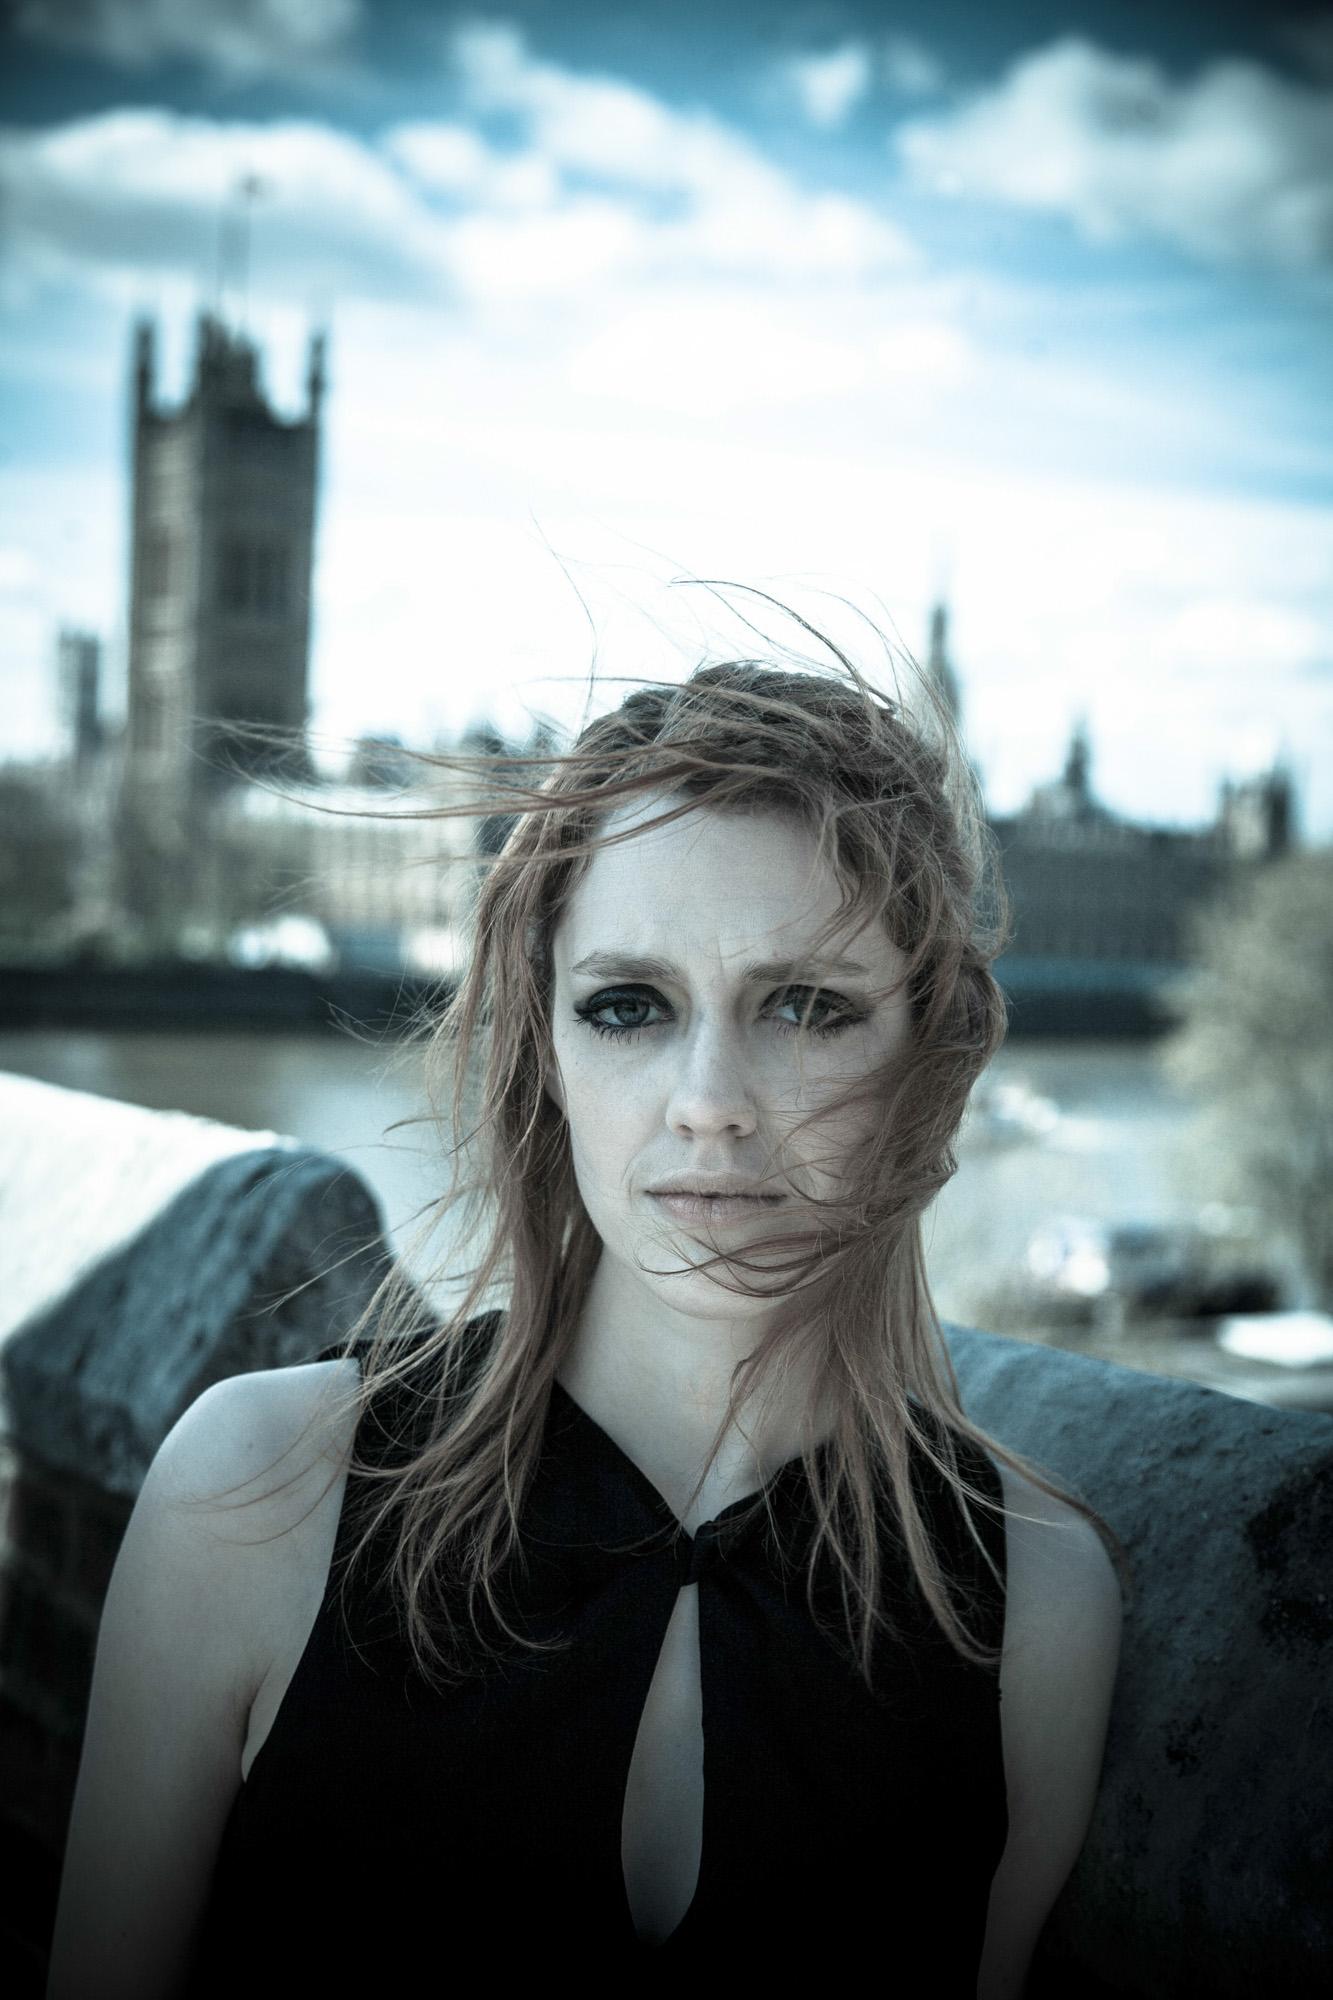 portraits-photographer-oxford-london-jonathan-self-photography_-53.jpg